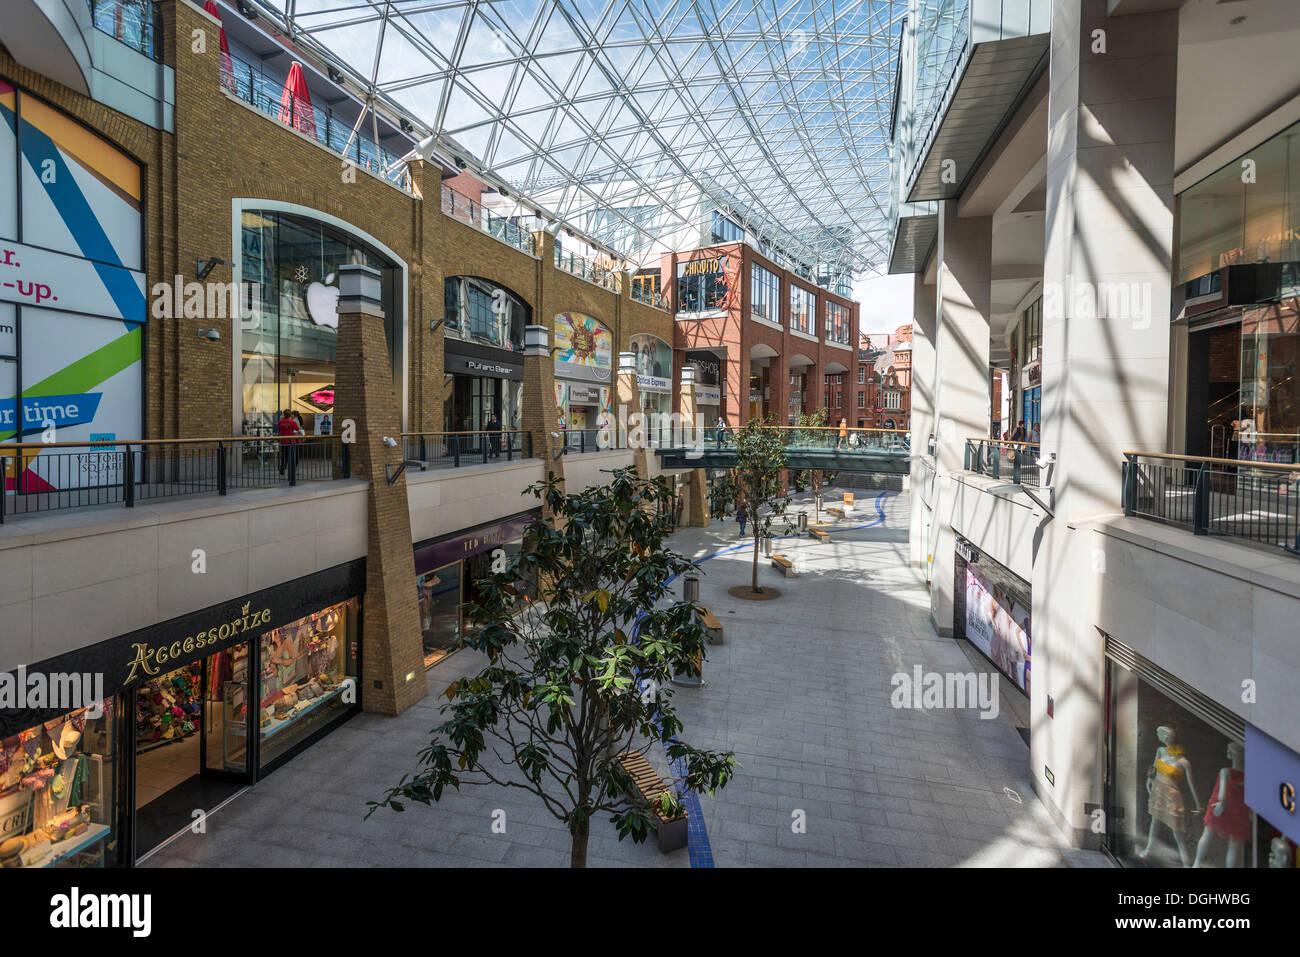 Victoria Square Shopping Centre, Belfast, Northern Ireland, United Kingdom, Europe - Stock Image